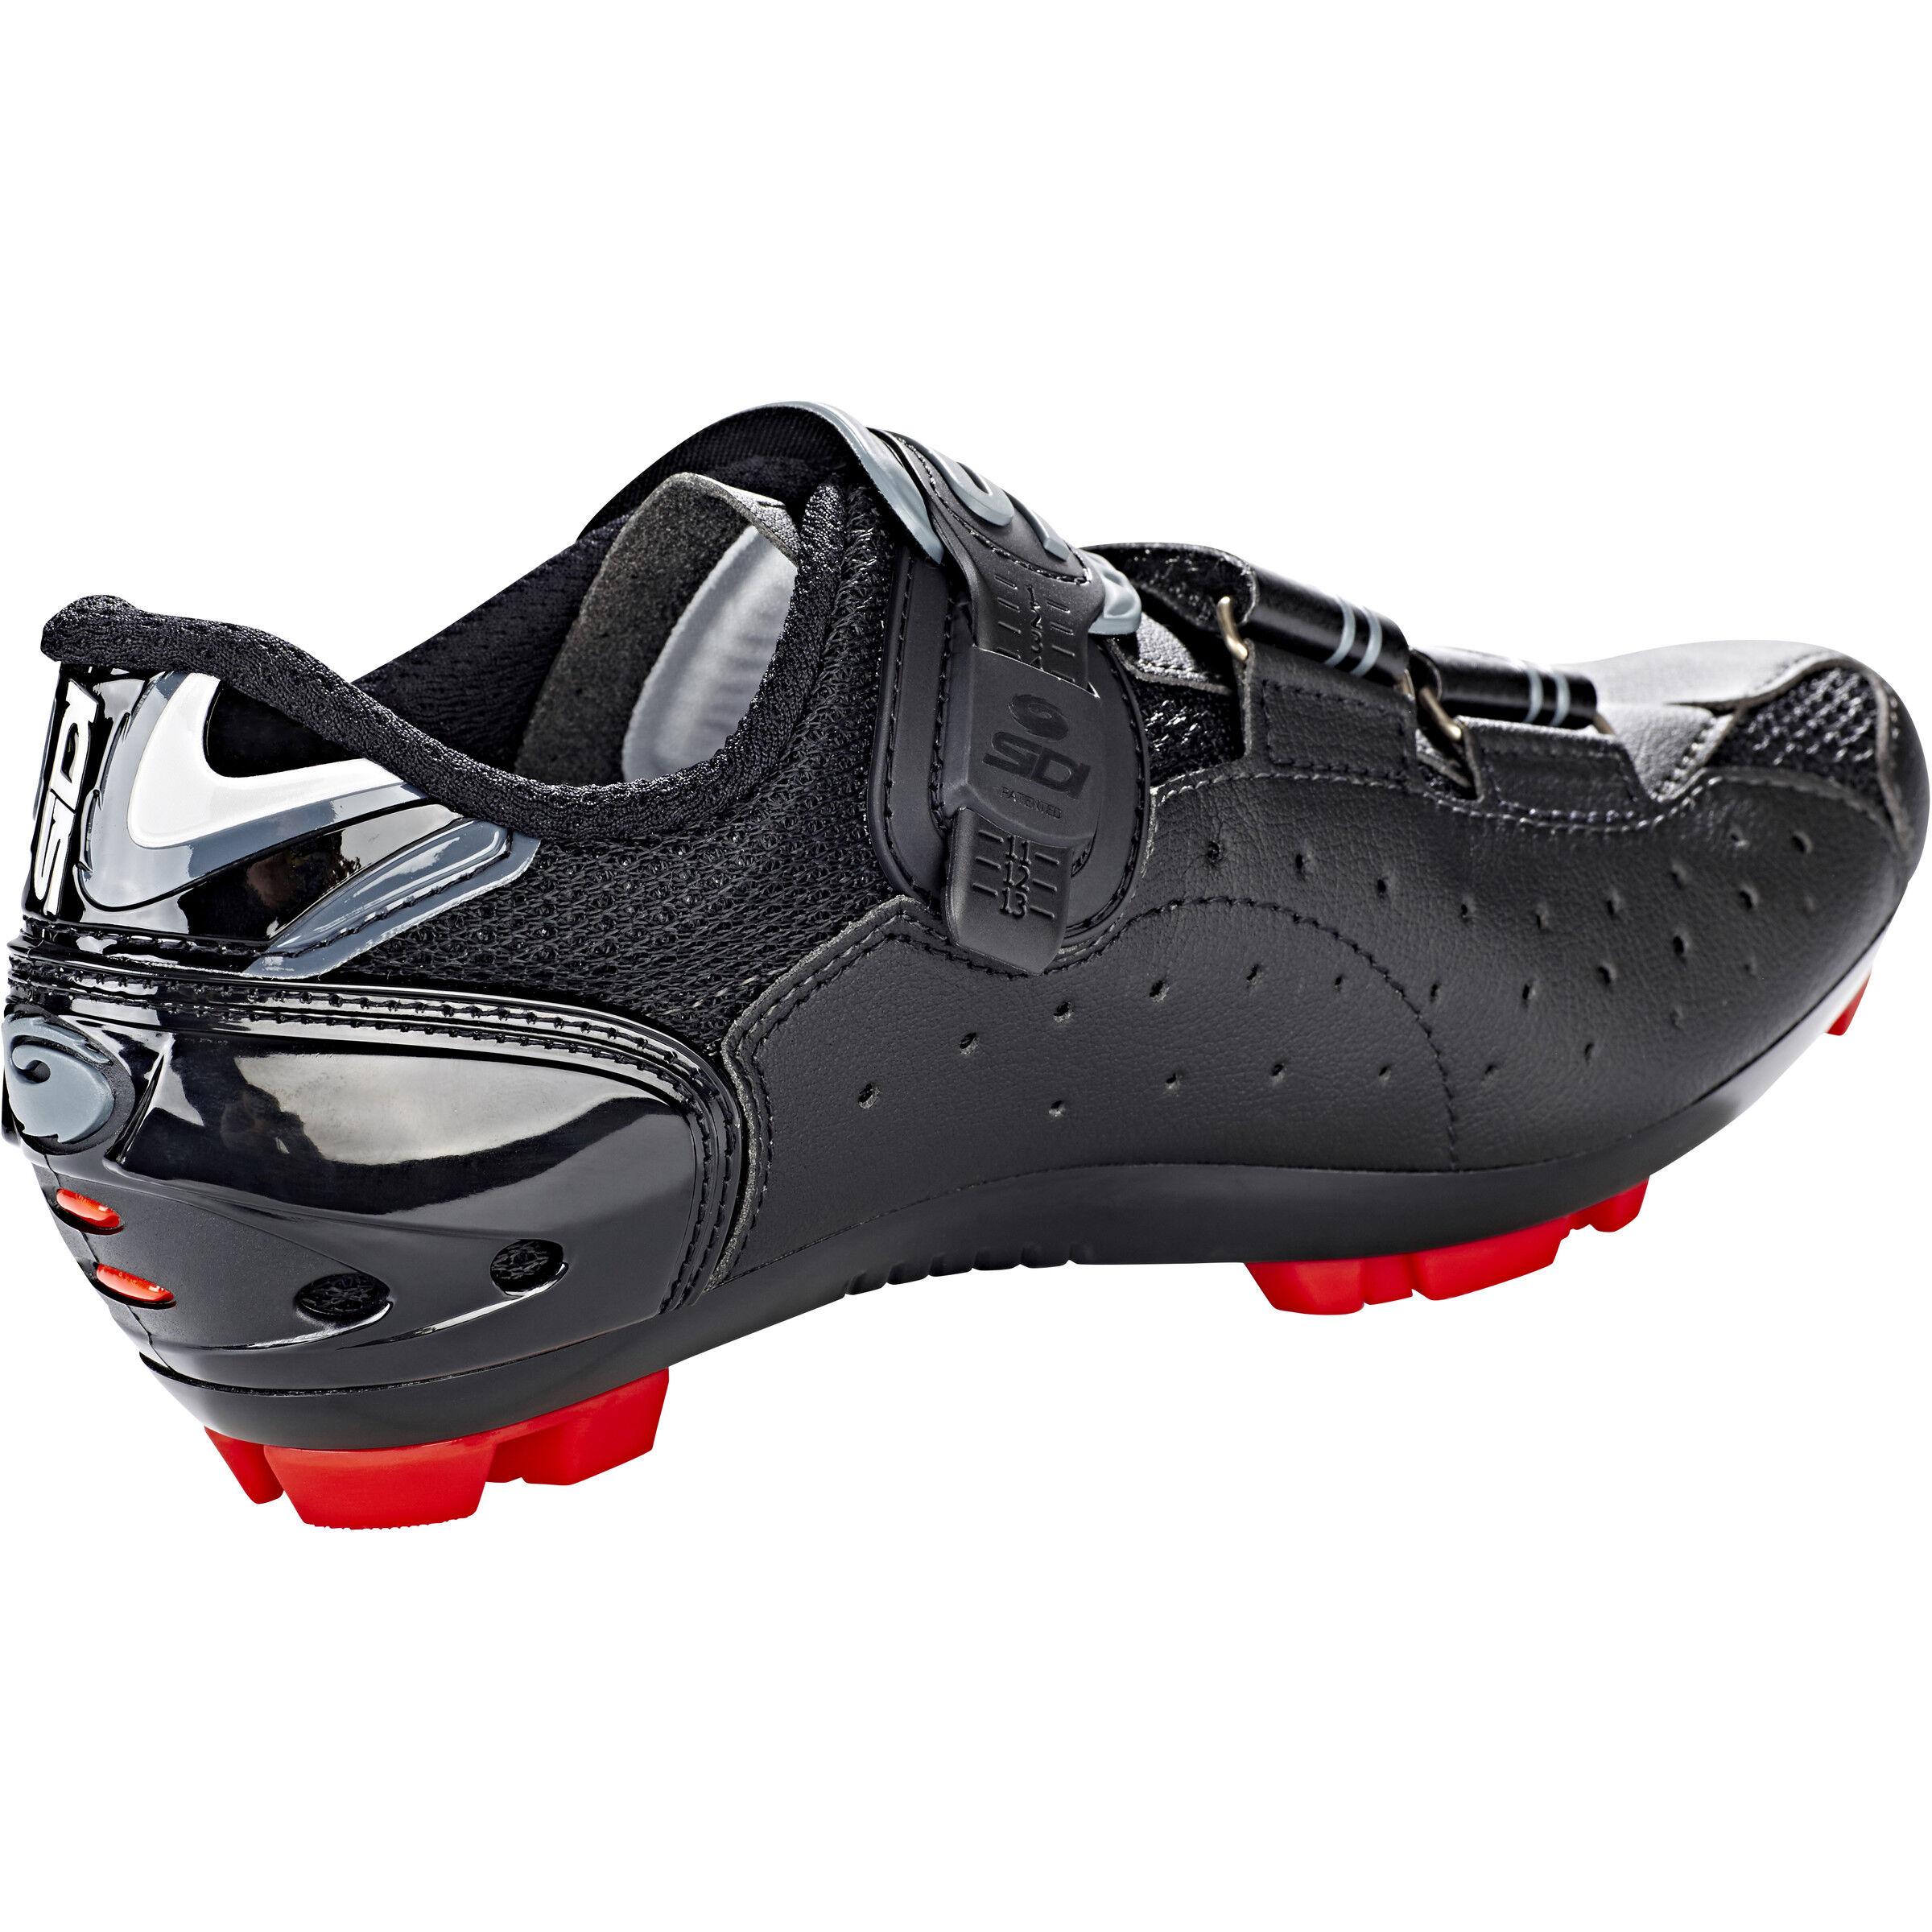 Shoes Kaufen Online Sidi Cwrqebxedo Mtb 7 Sr Herren Eagle 7yf6bg